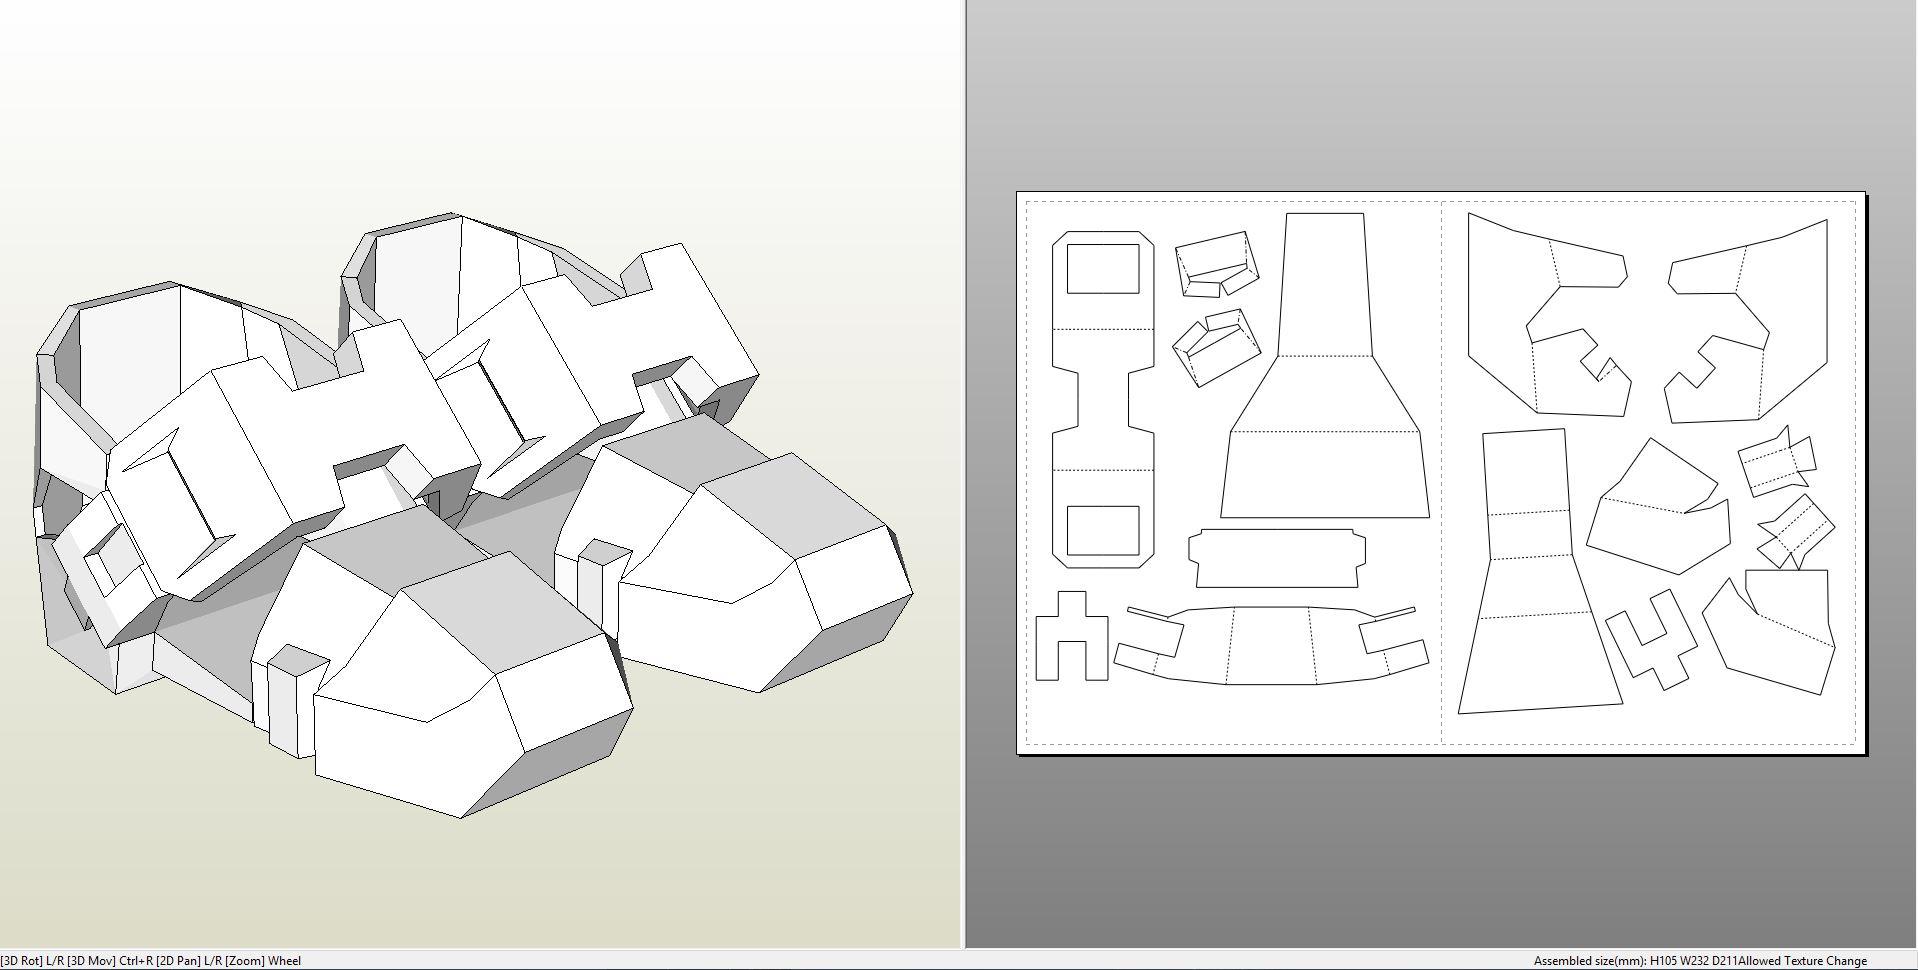 iron man foam armor templates - foamcraft pdo file template for halo 4 forward unto